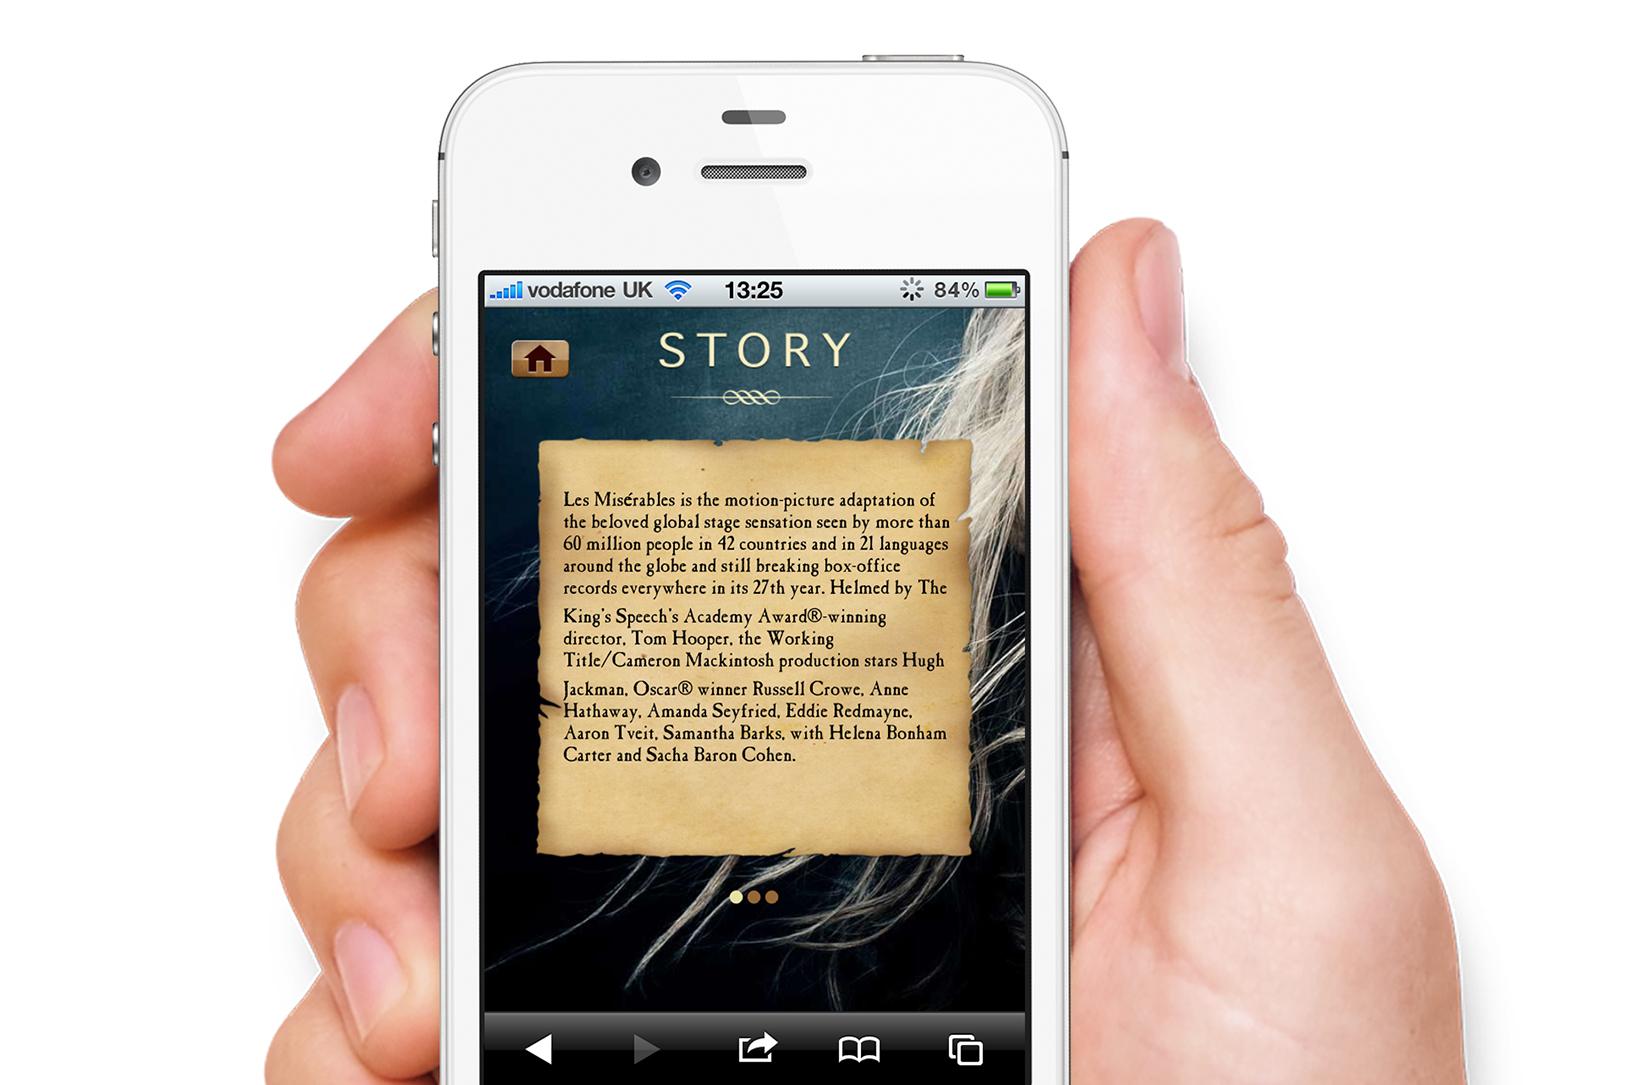 Story screen.